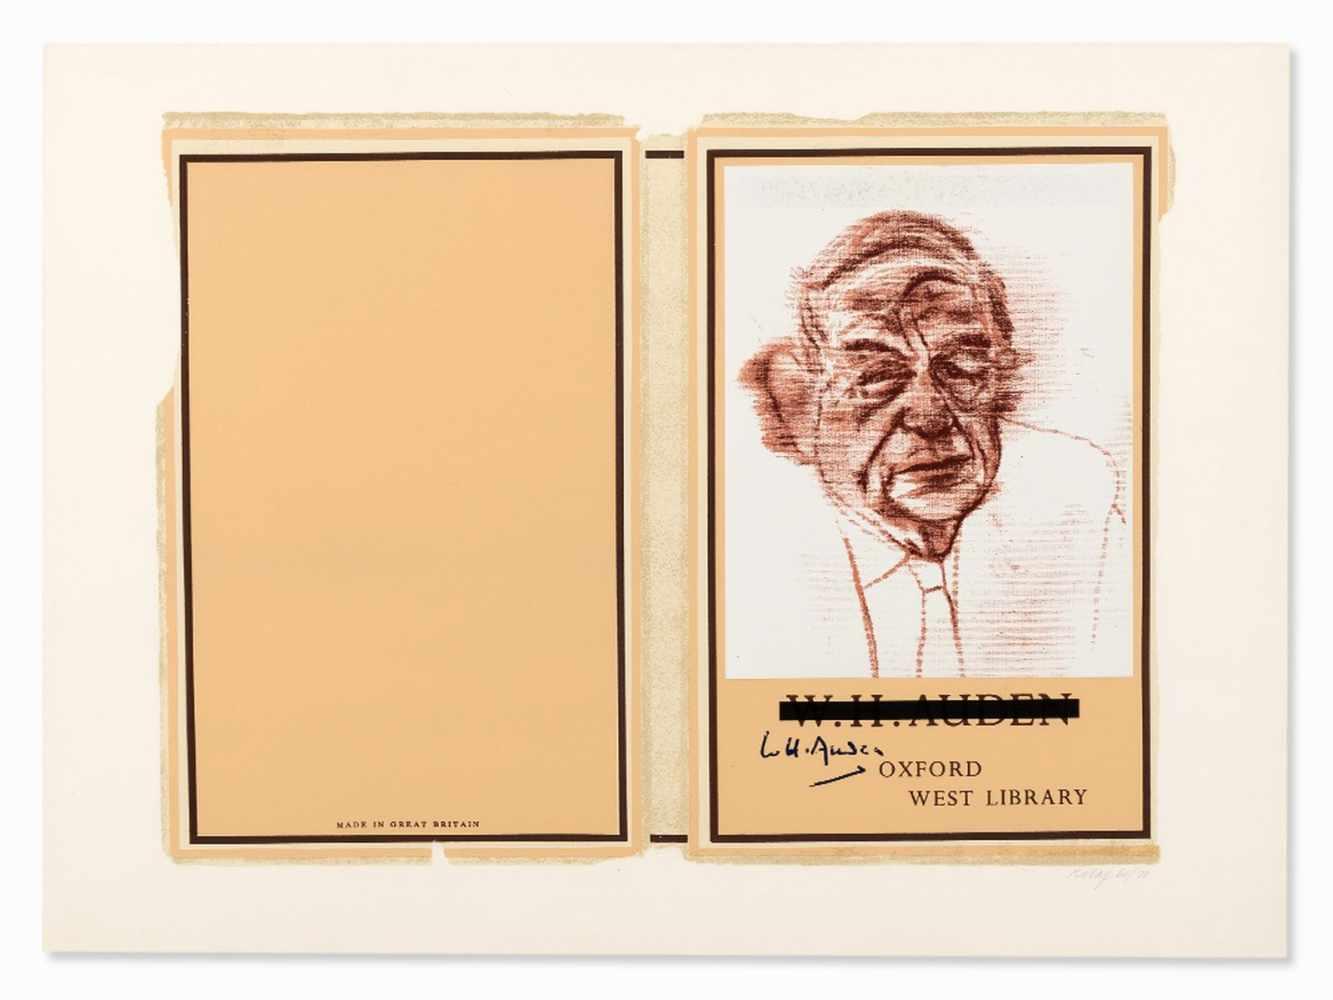 R.B. Kitaj (1887-1948), W.H. Auden, Color Serigraph, 1969 - Image 2 of 10